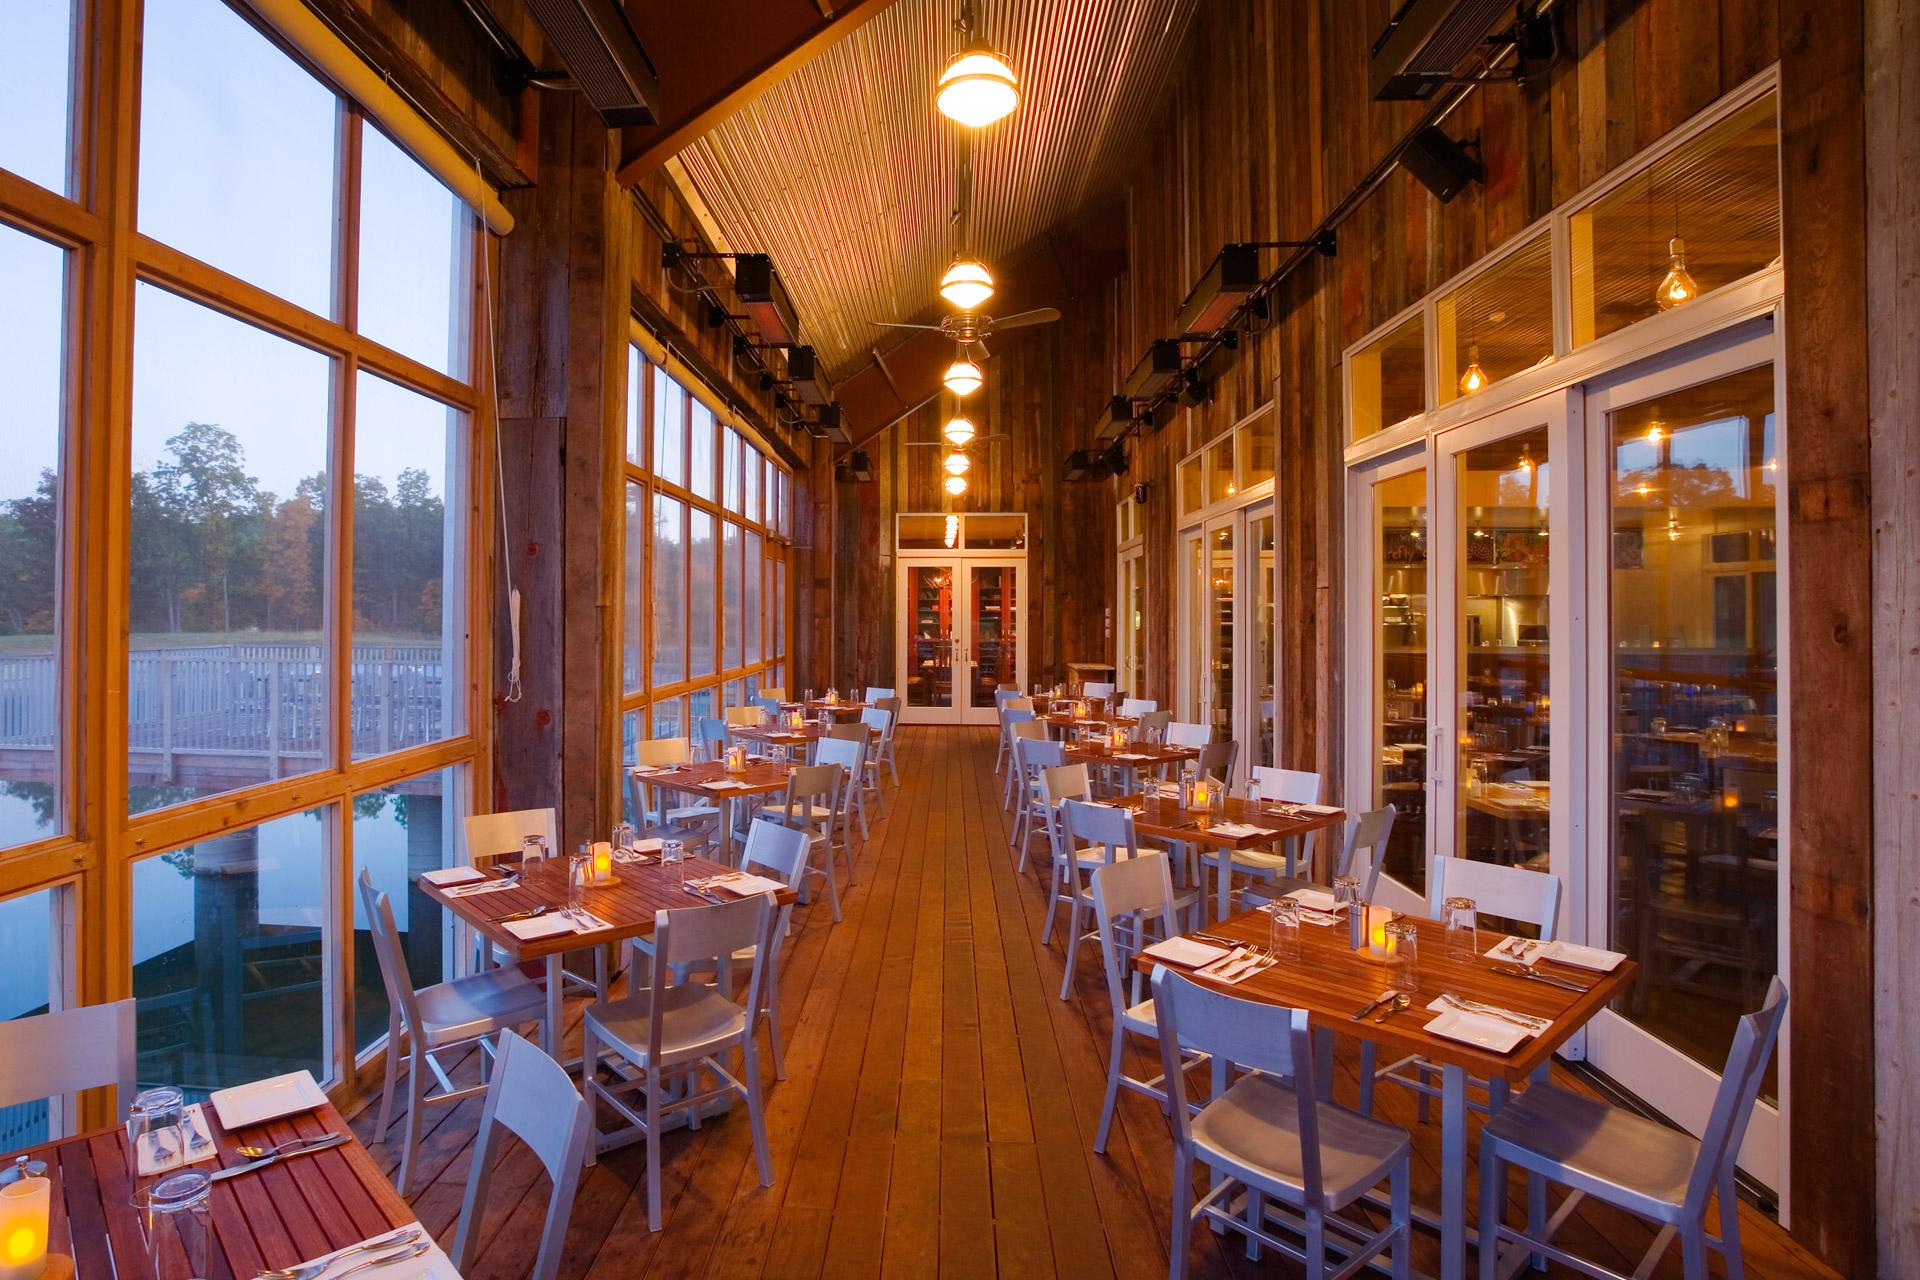 Firefly Grill restaurant decor